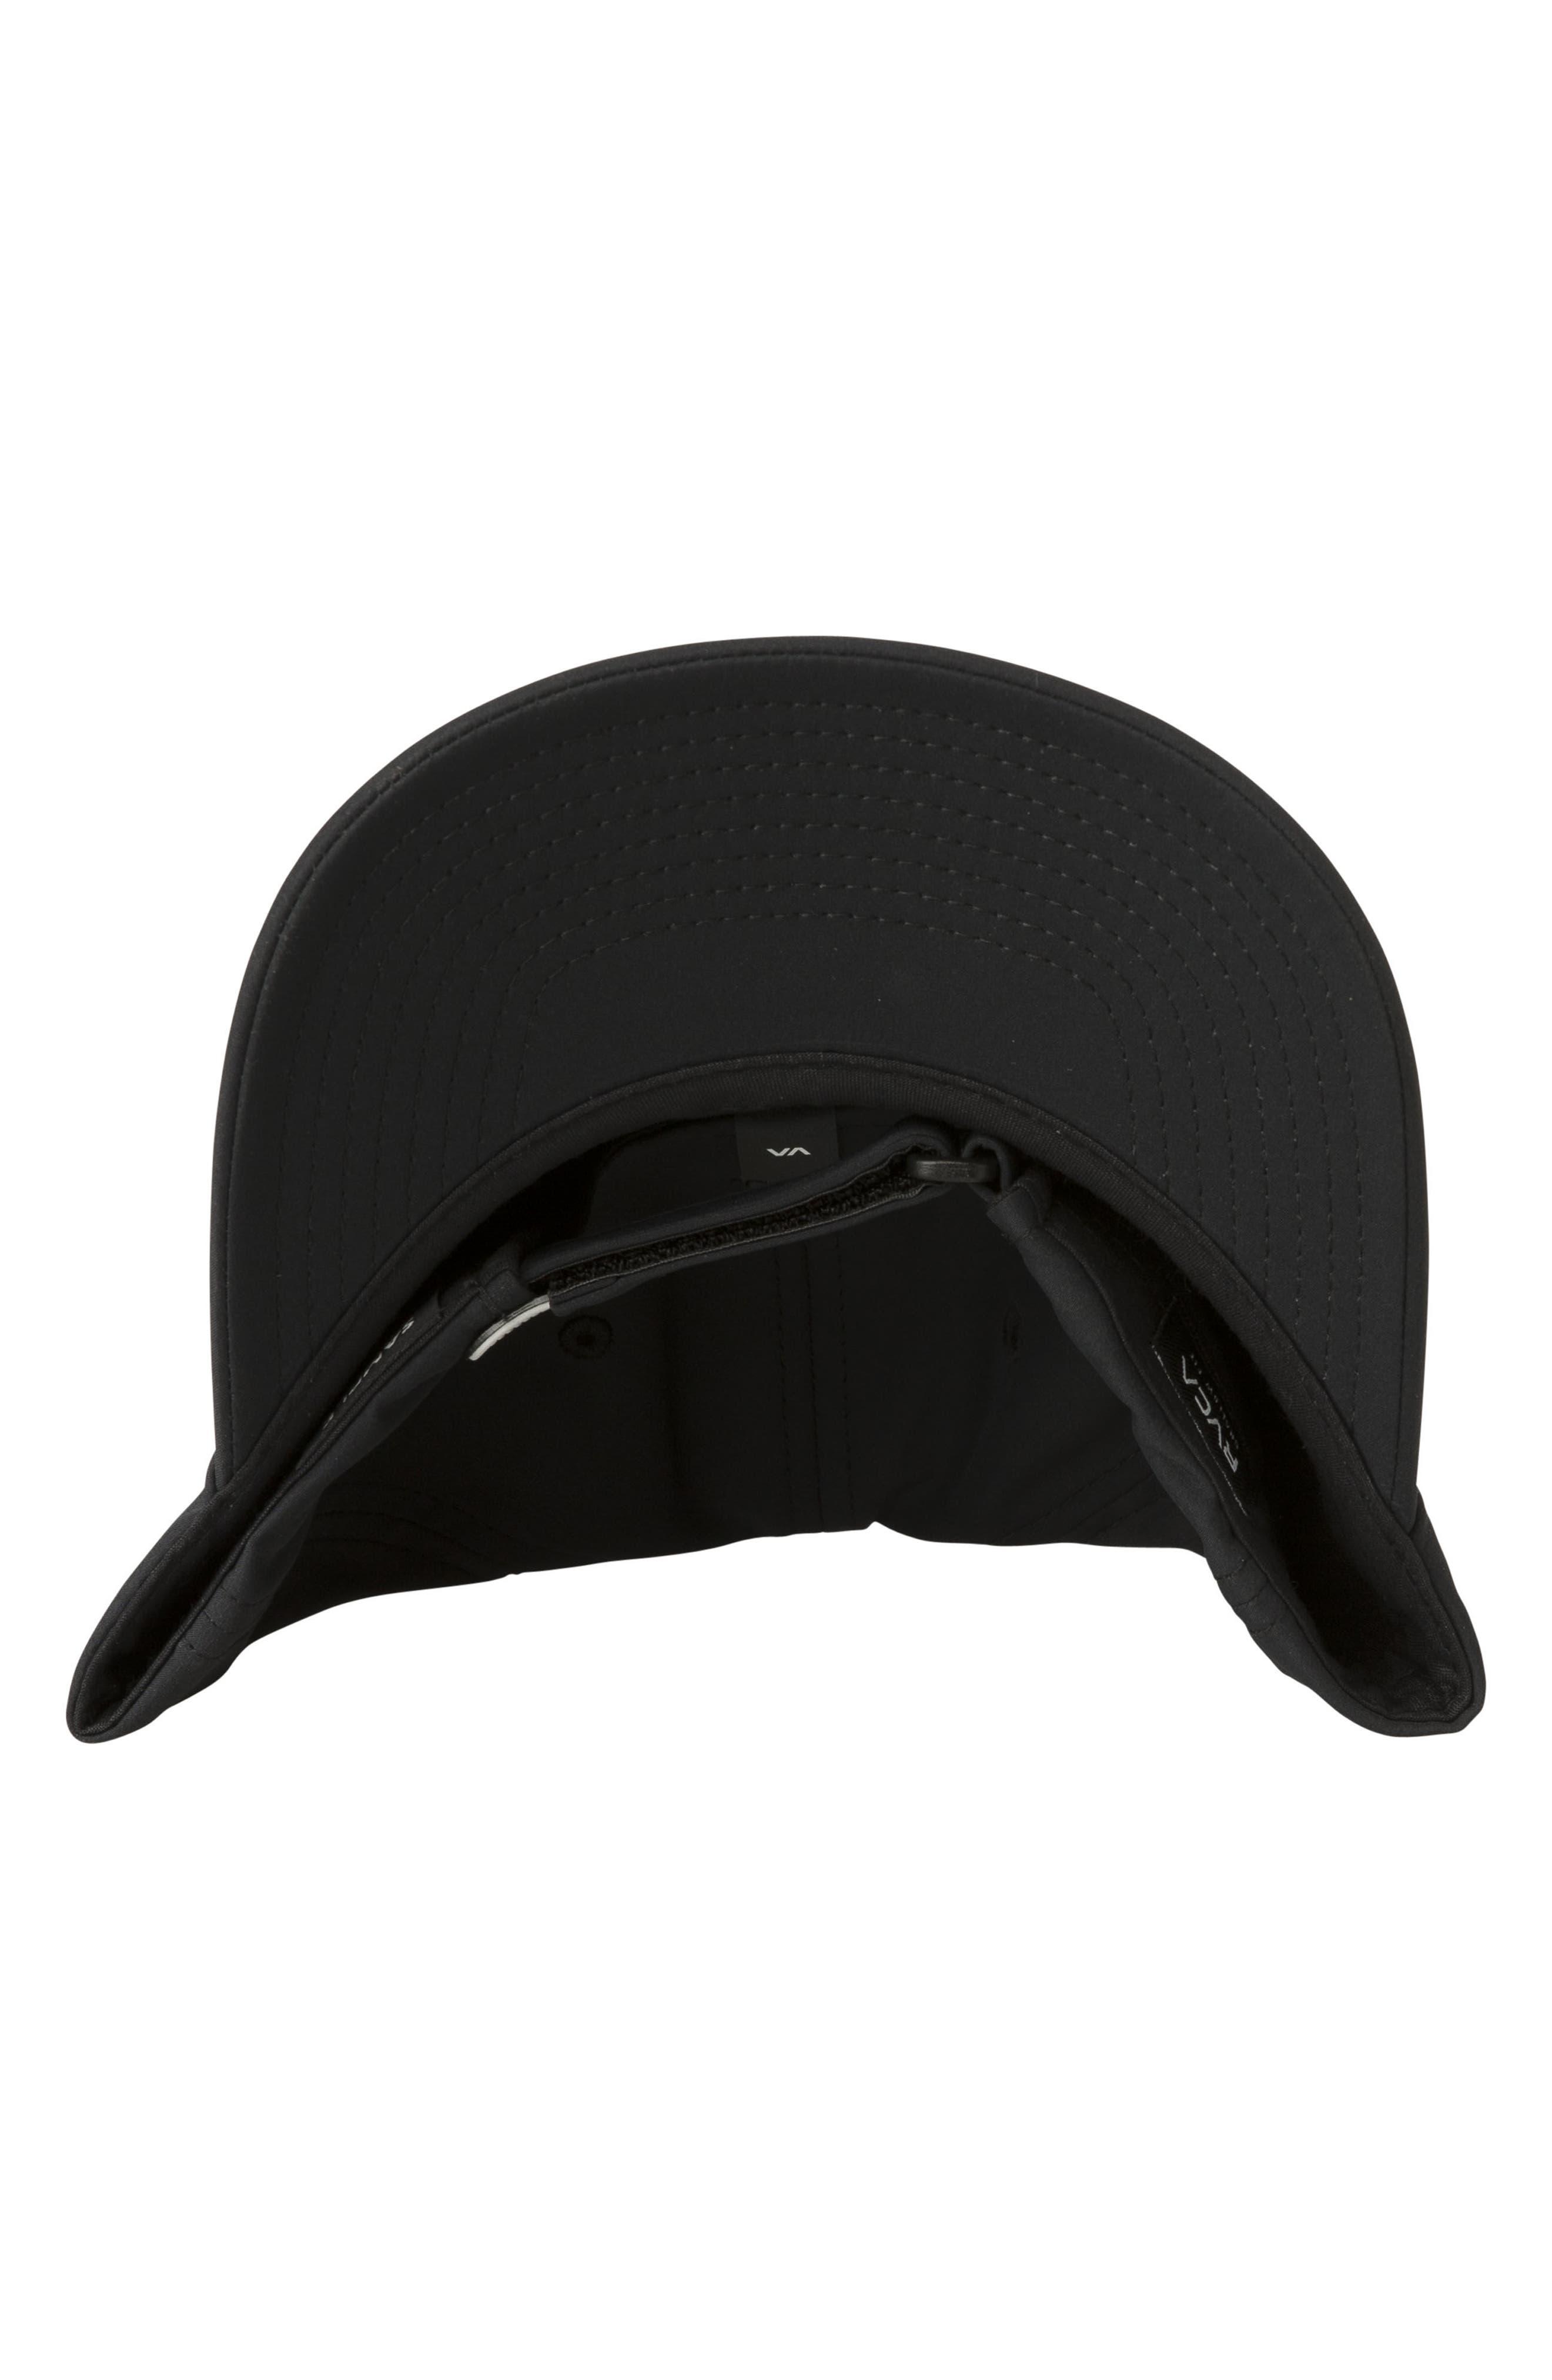 RA Sport Trainer Baseball Cap,                             Alternate thumbnail 2, color,                             001